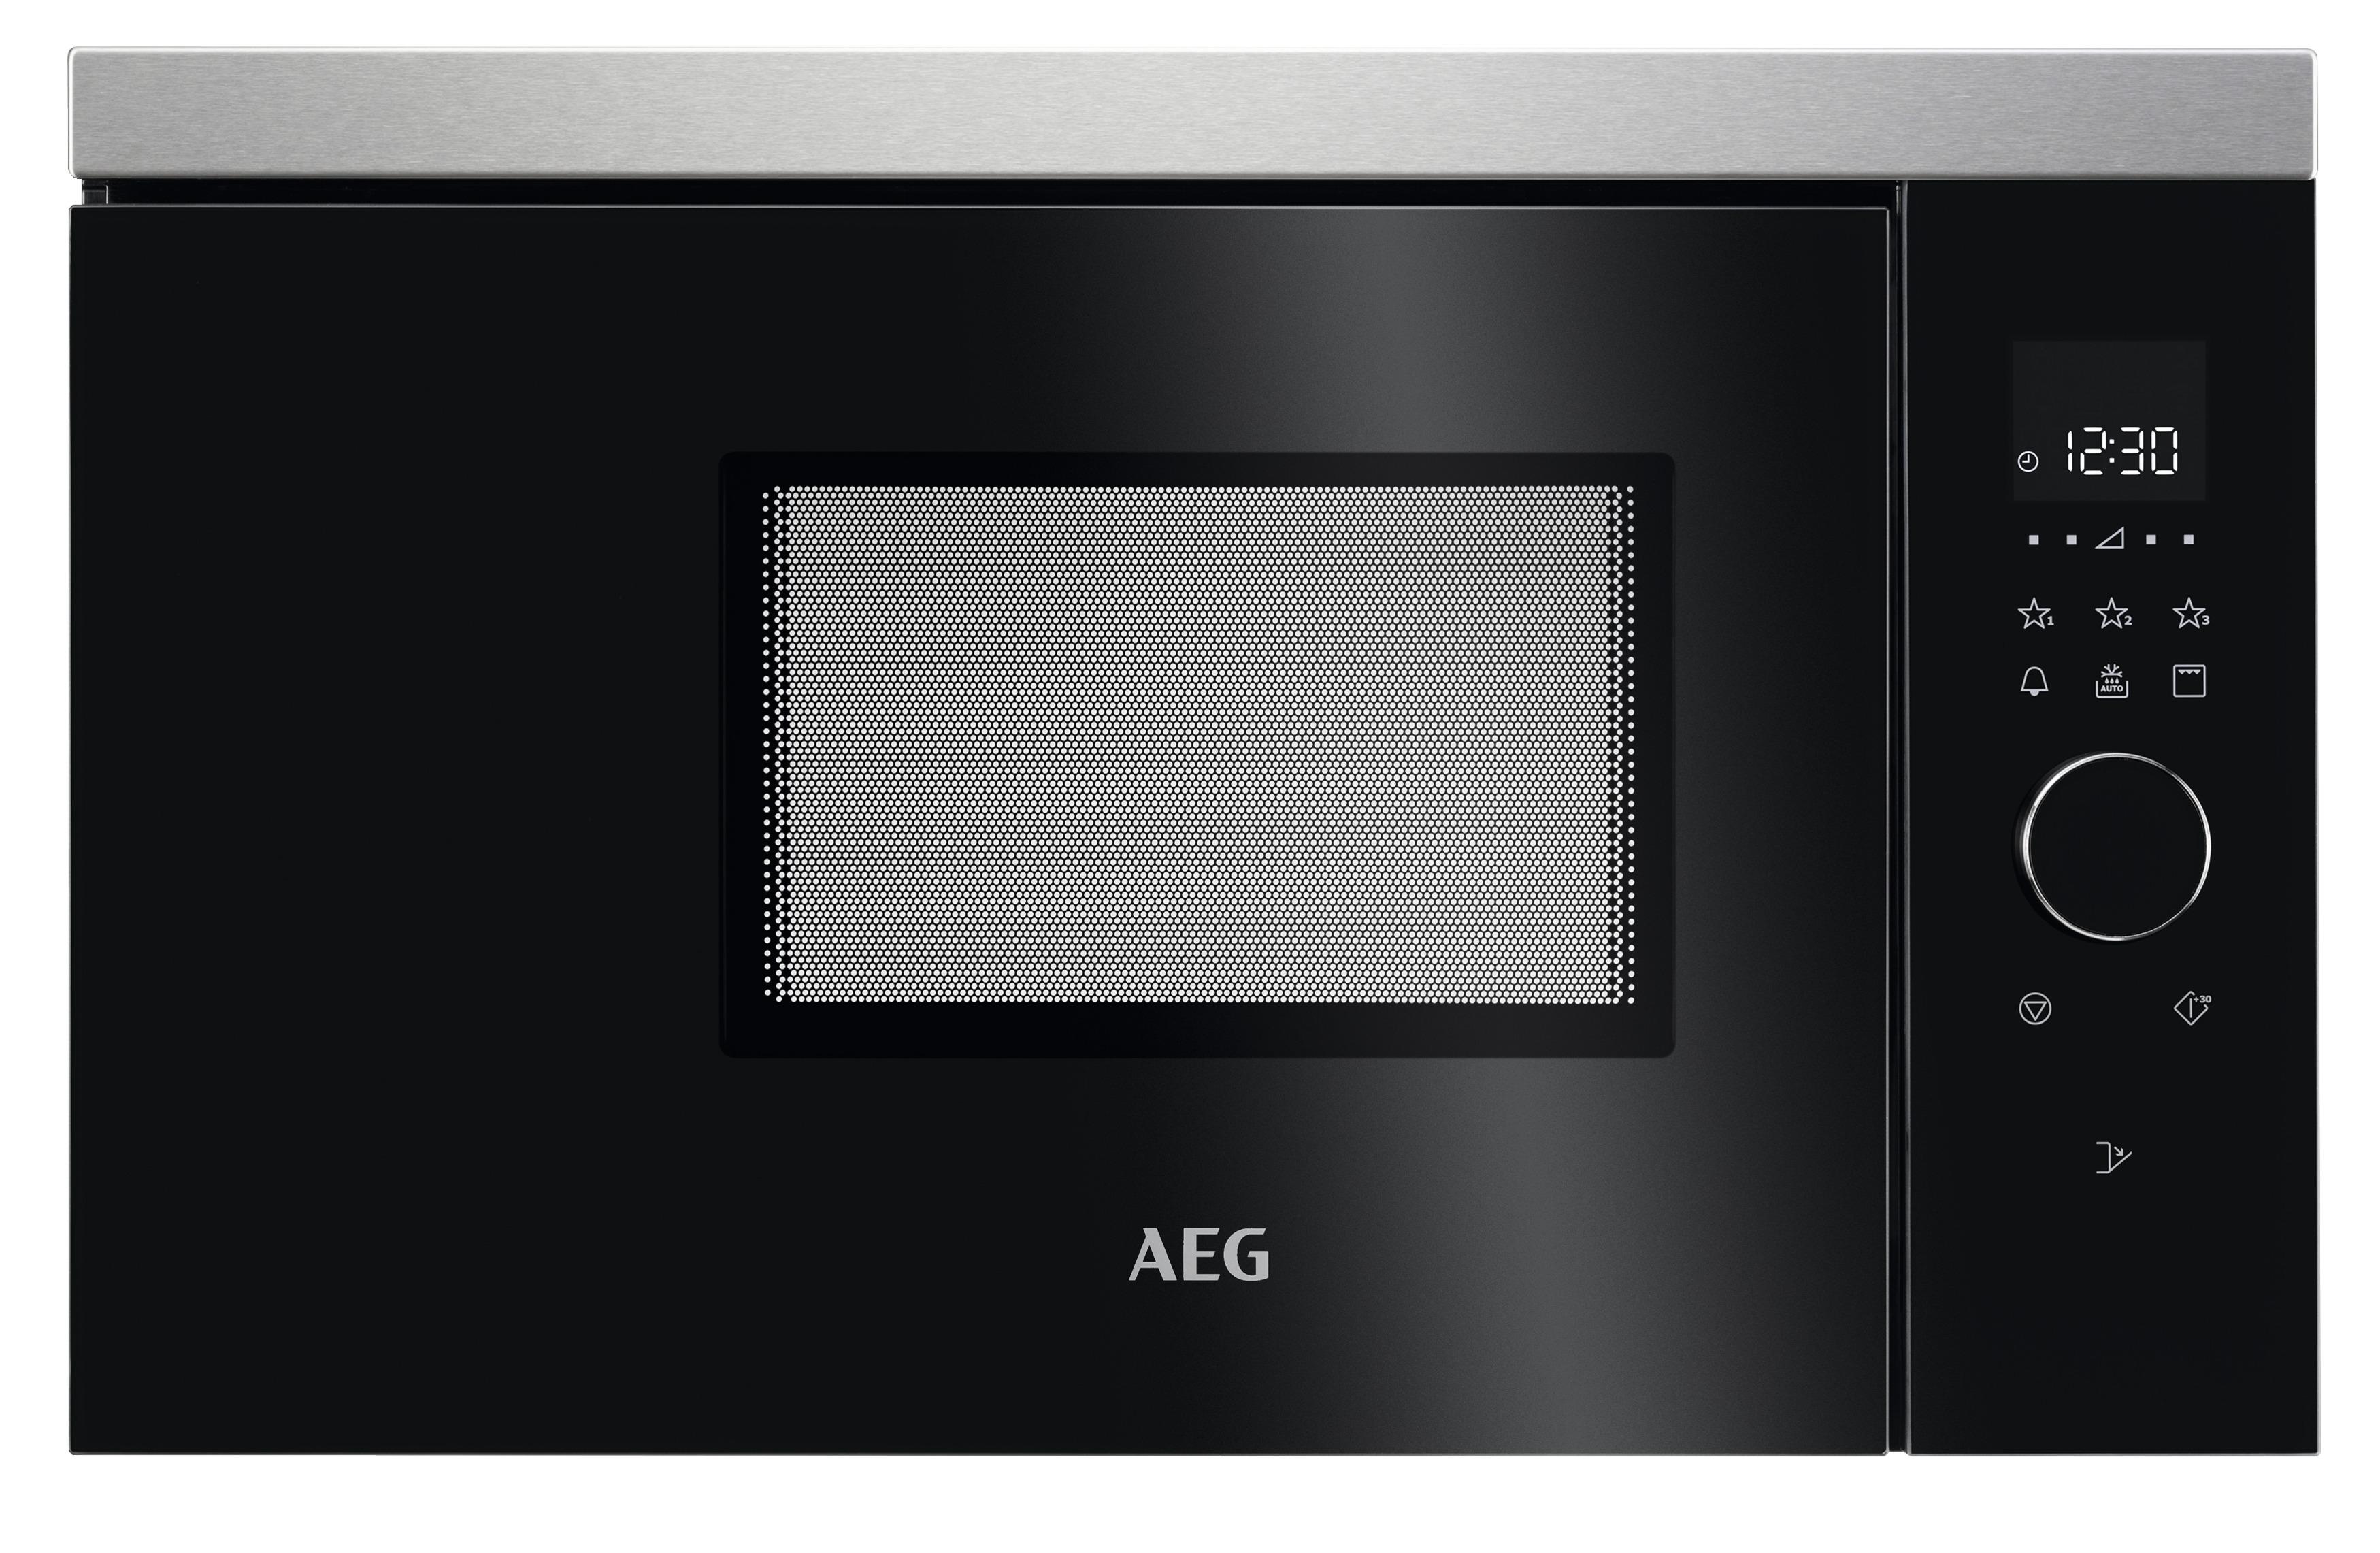 AEG MBB1756DEM Inbouw combi magnetron Staal